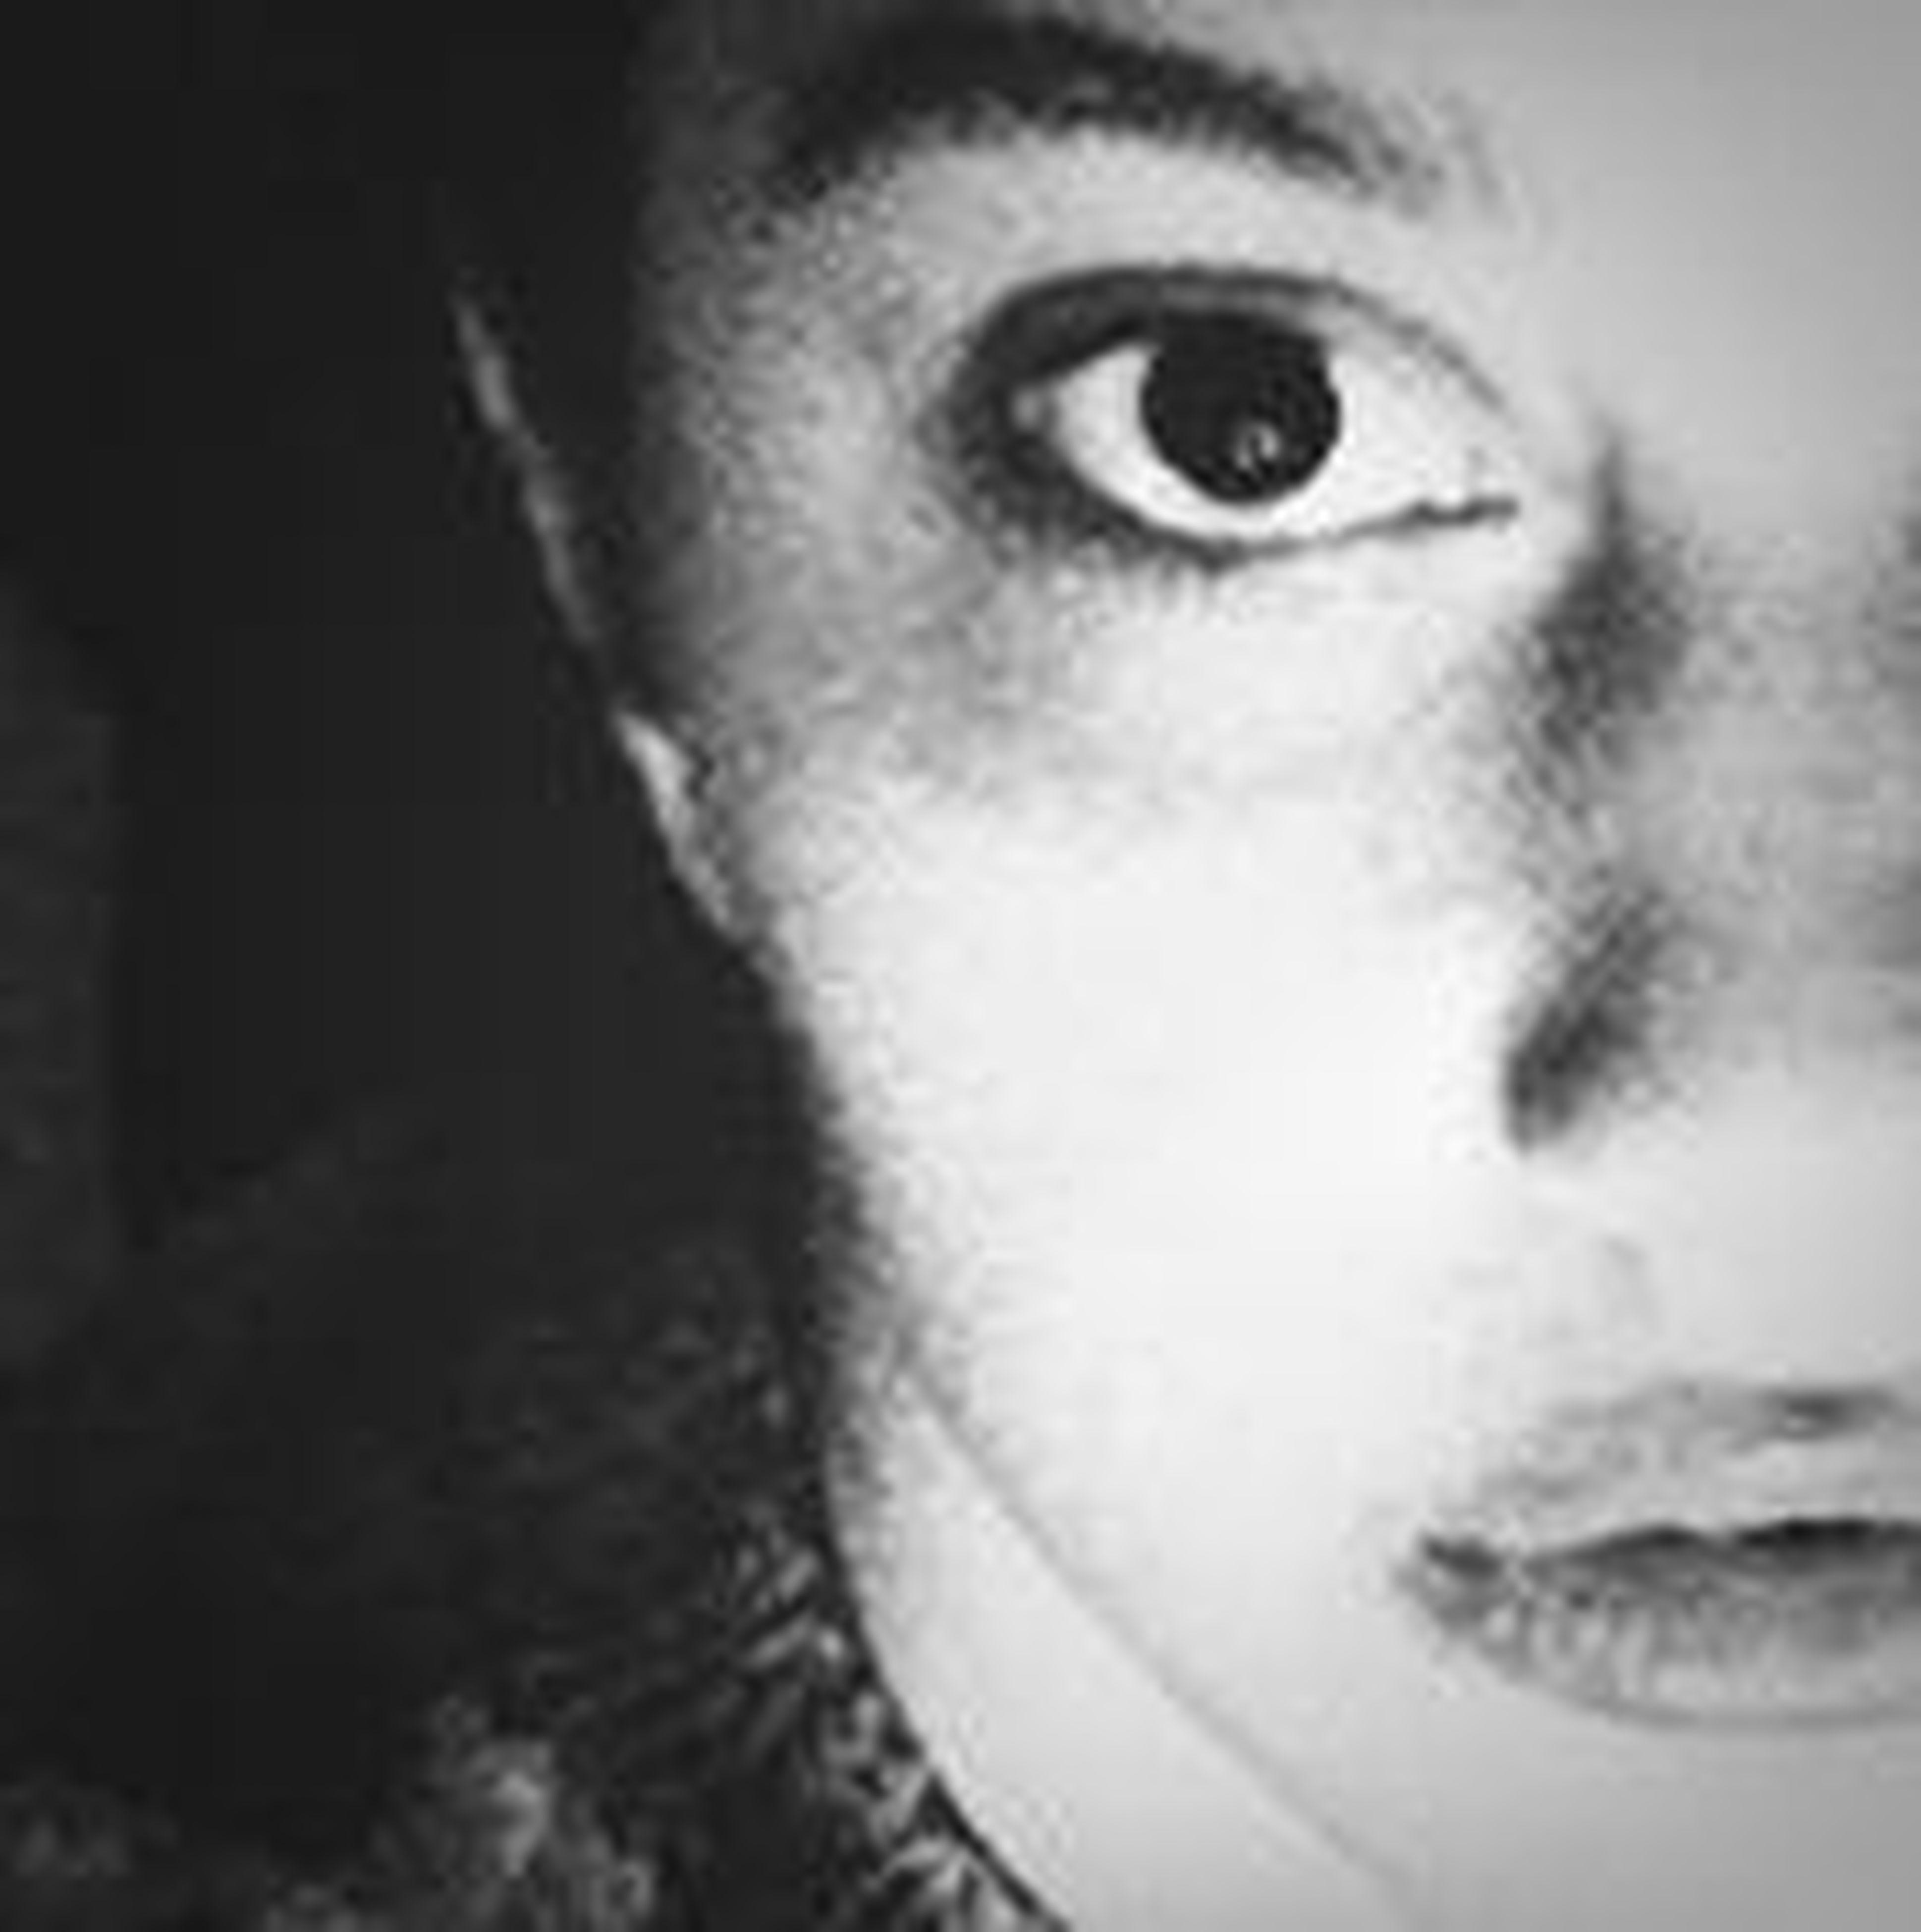 close-up, portrait, looking at camera, indoors, human face, headshot, human eye, part of, lifestyles, front view, human skin, studio shot, staring, eyelash, young adult, serious, eyesight